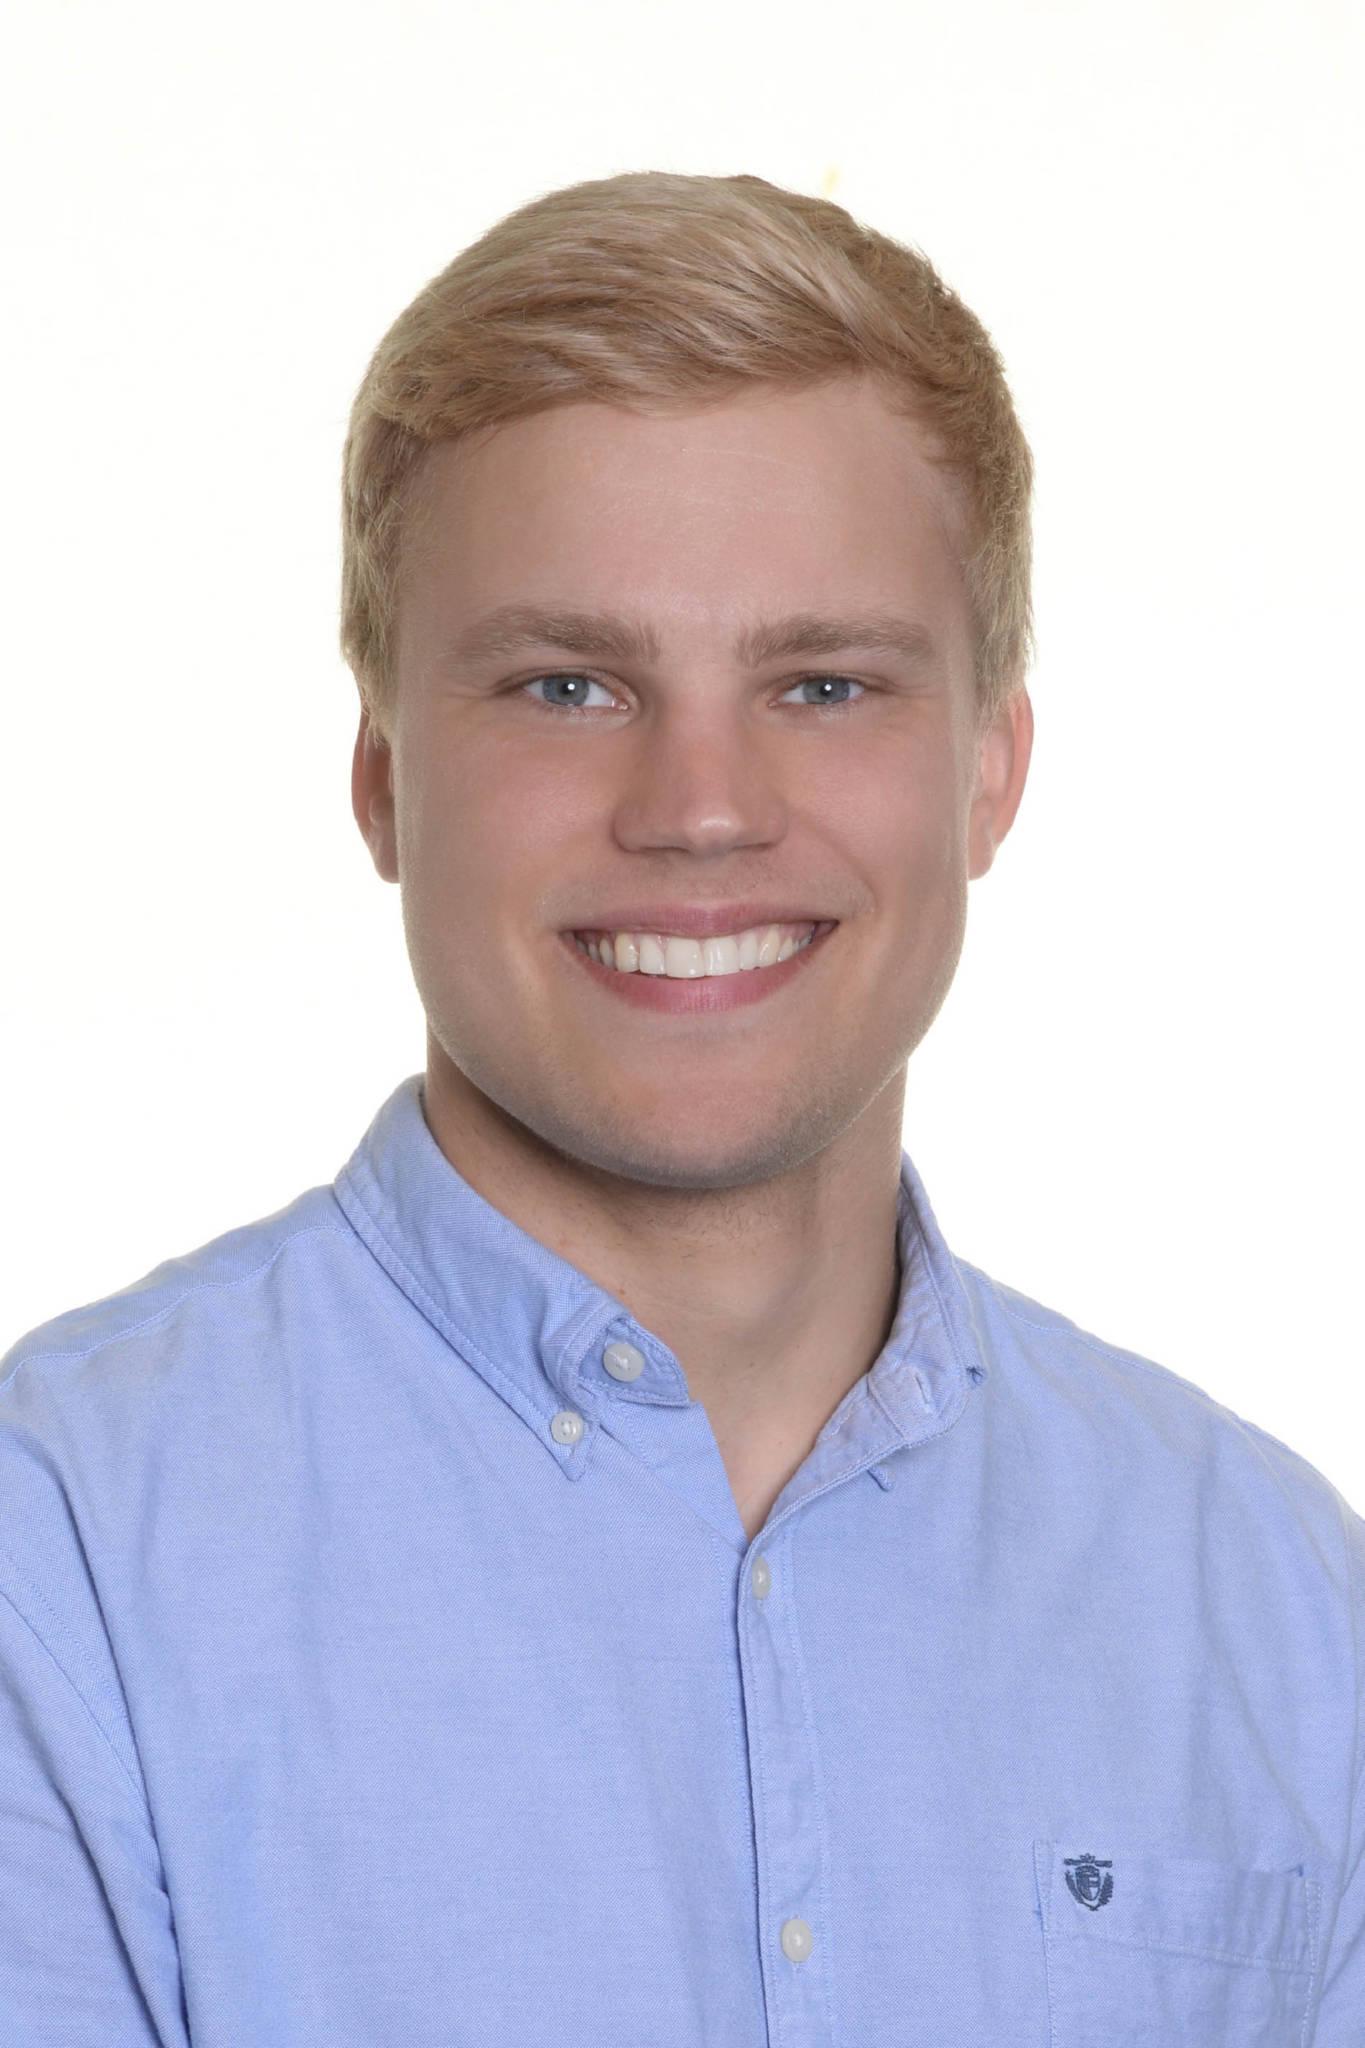 Christian Wrang, CW